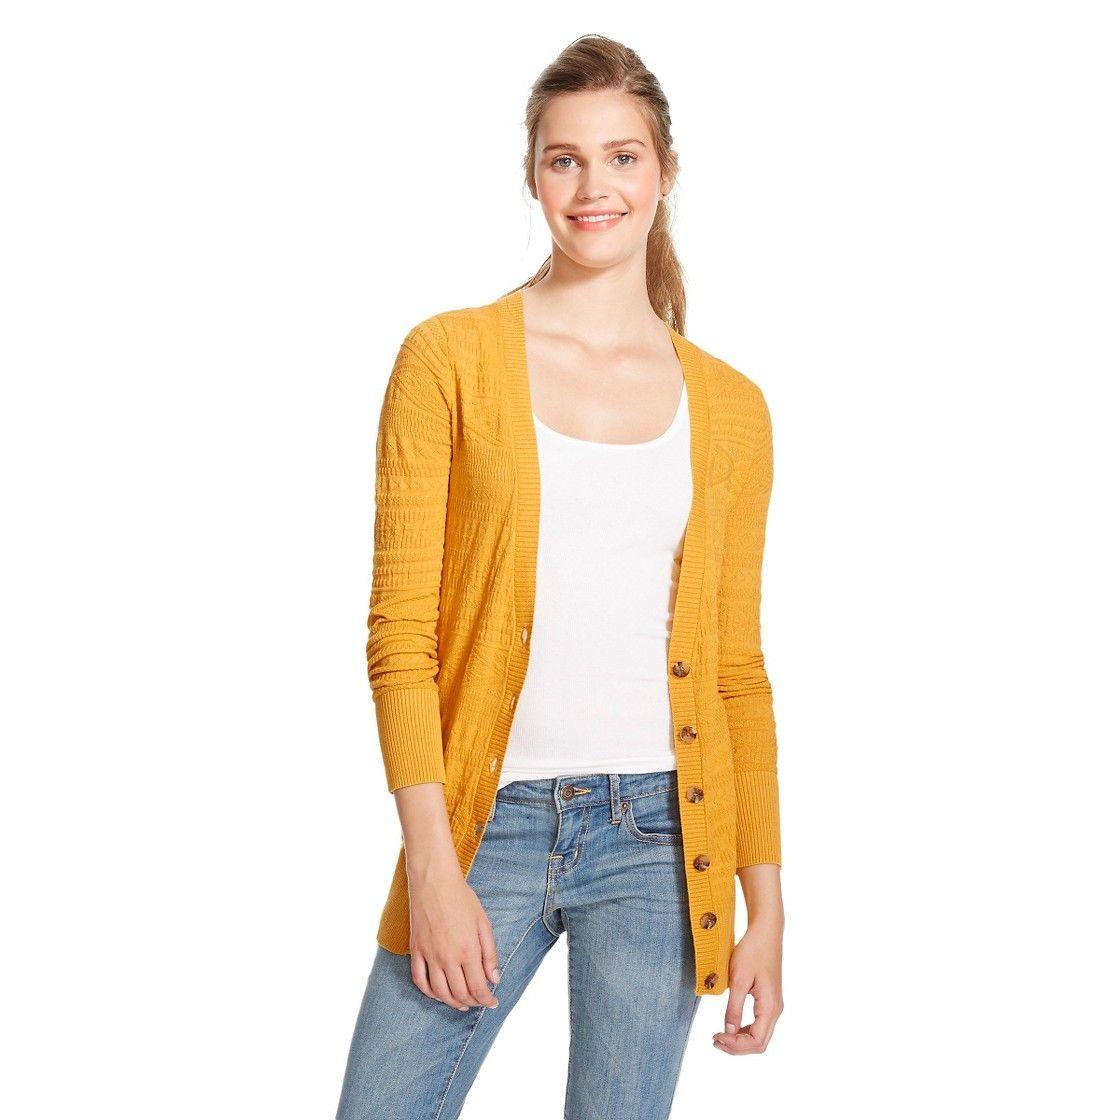 Jacquard Boyfriend Cardigans - Mossimo Supply Co. | Fashion ...